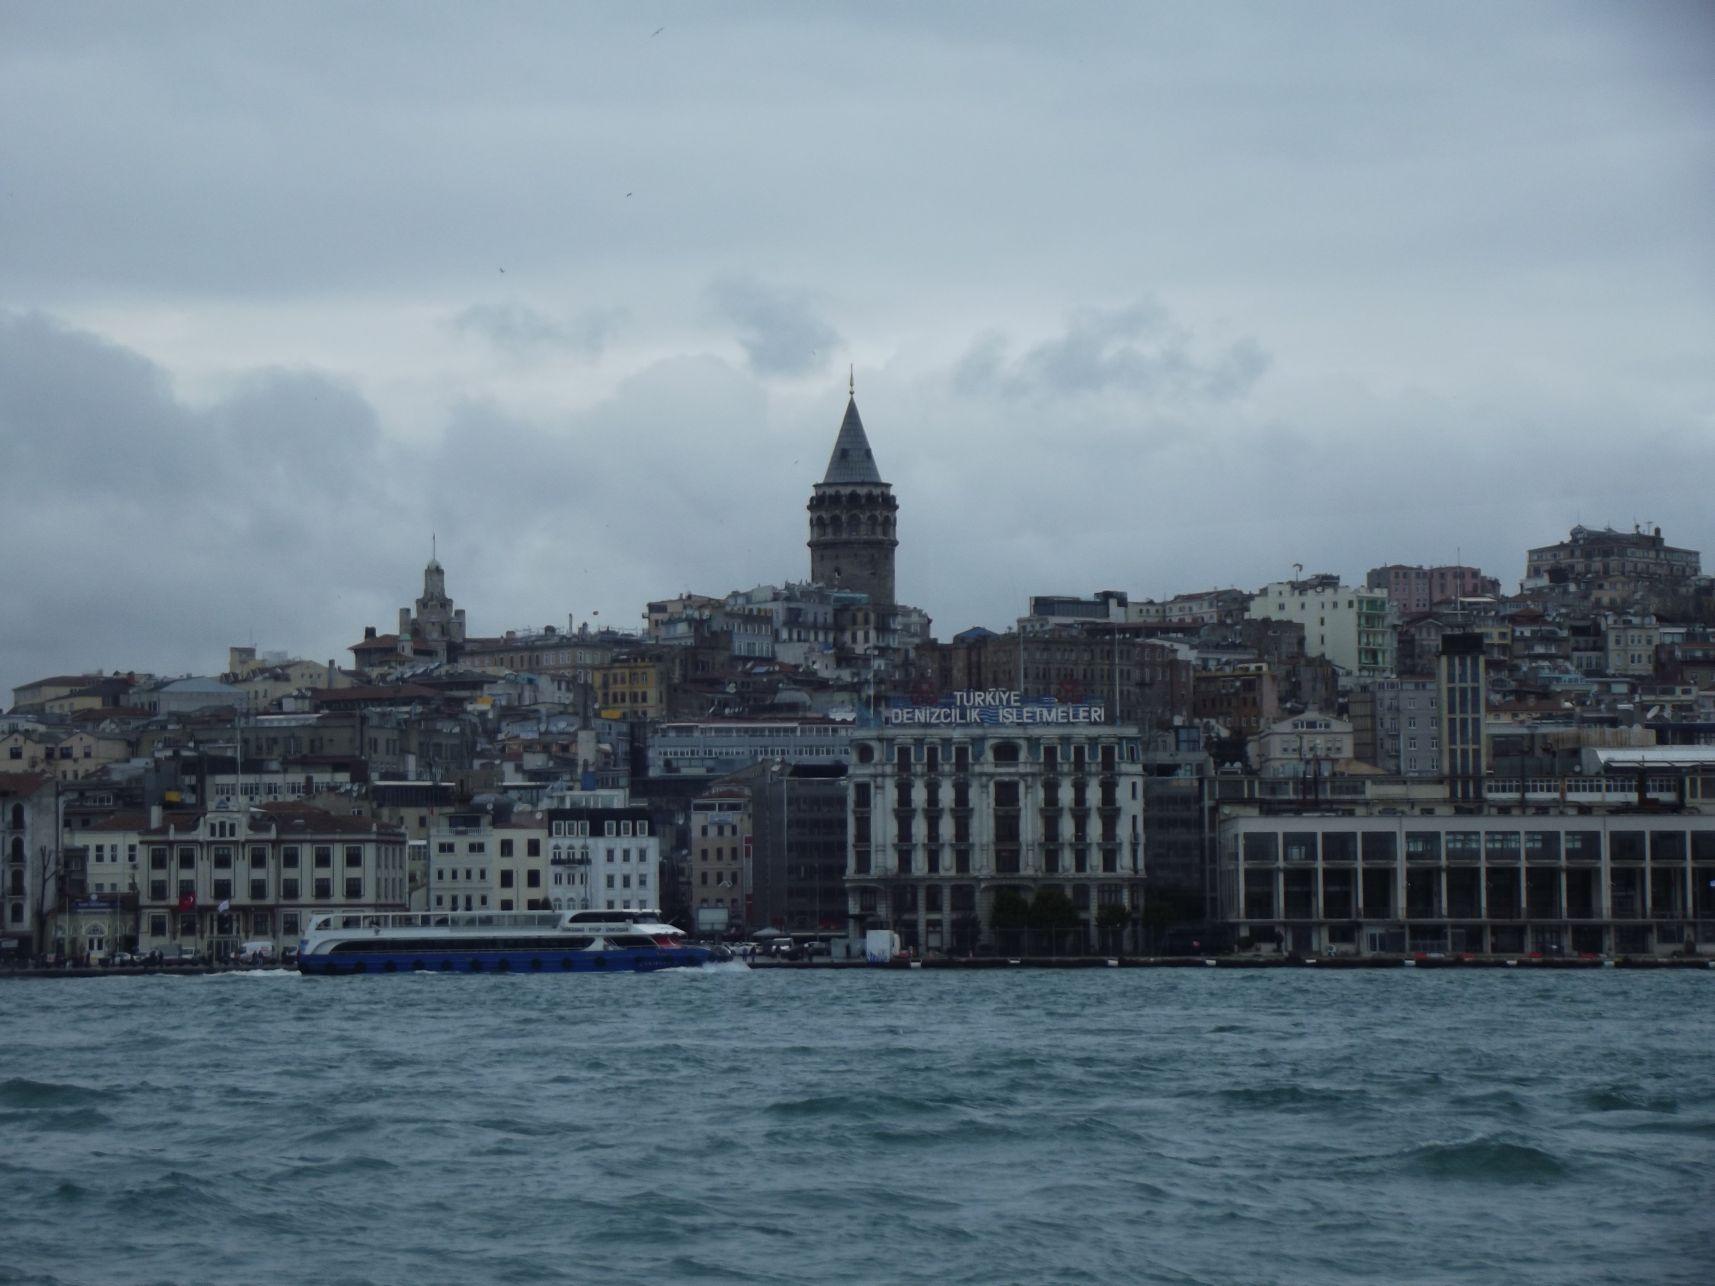 Galata-torony a hajóról